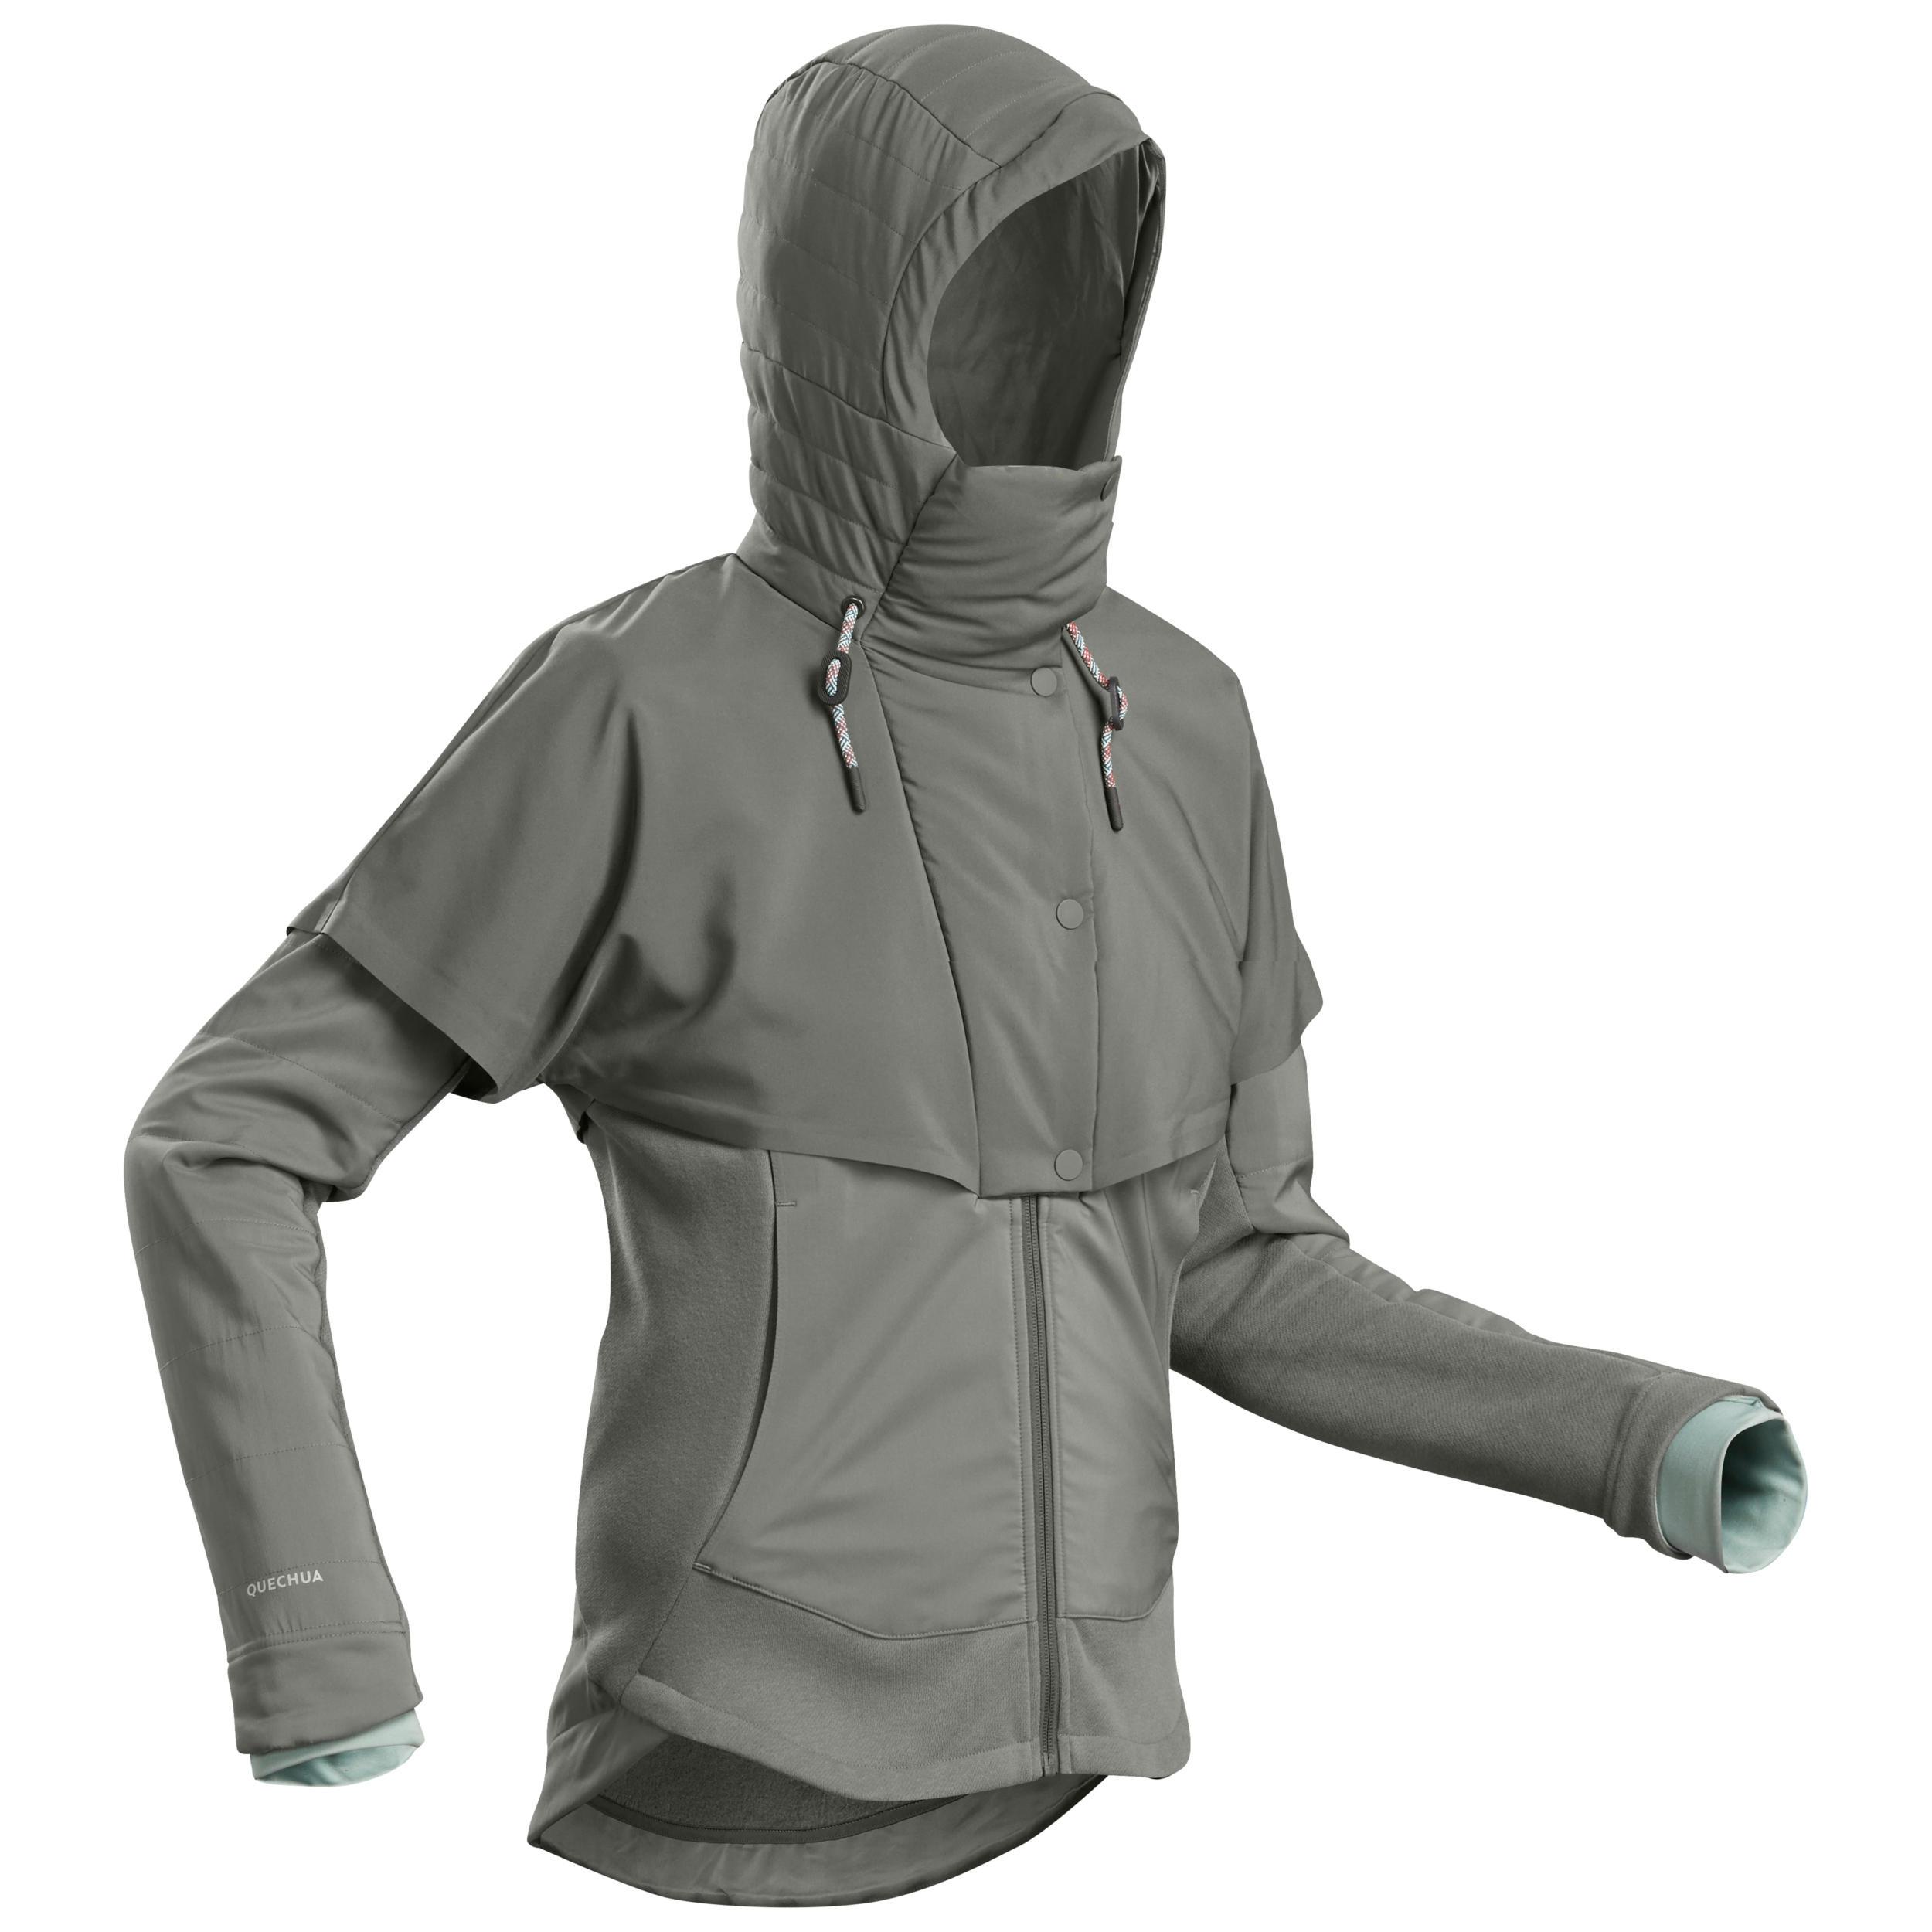 Hybridjacke Sweatjacke Naturwandern NH500 Damen | Bekleidung > Sweatshirts & -jacken > Sweatjacken | Quechua